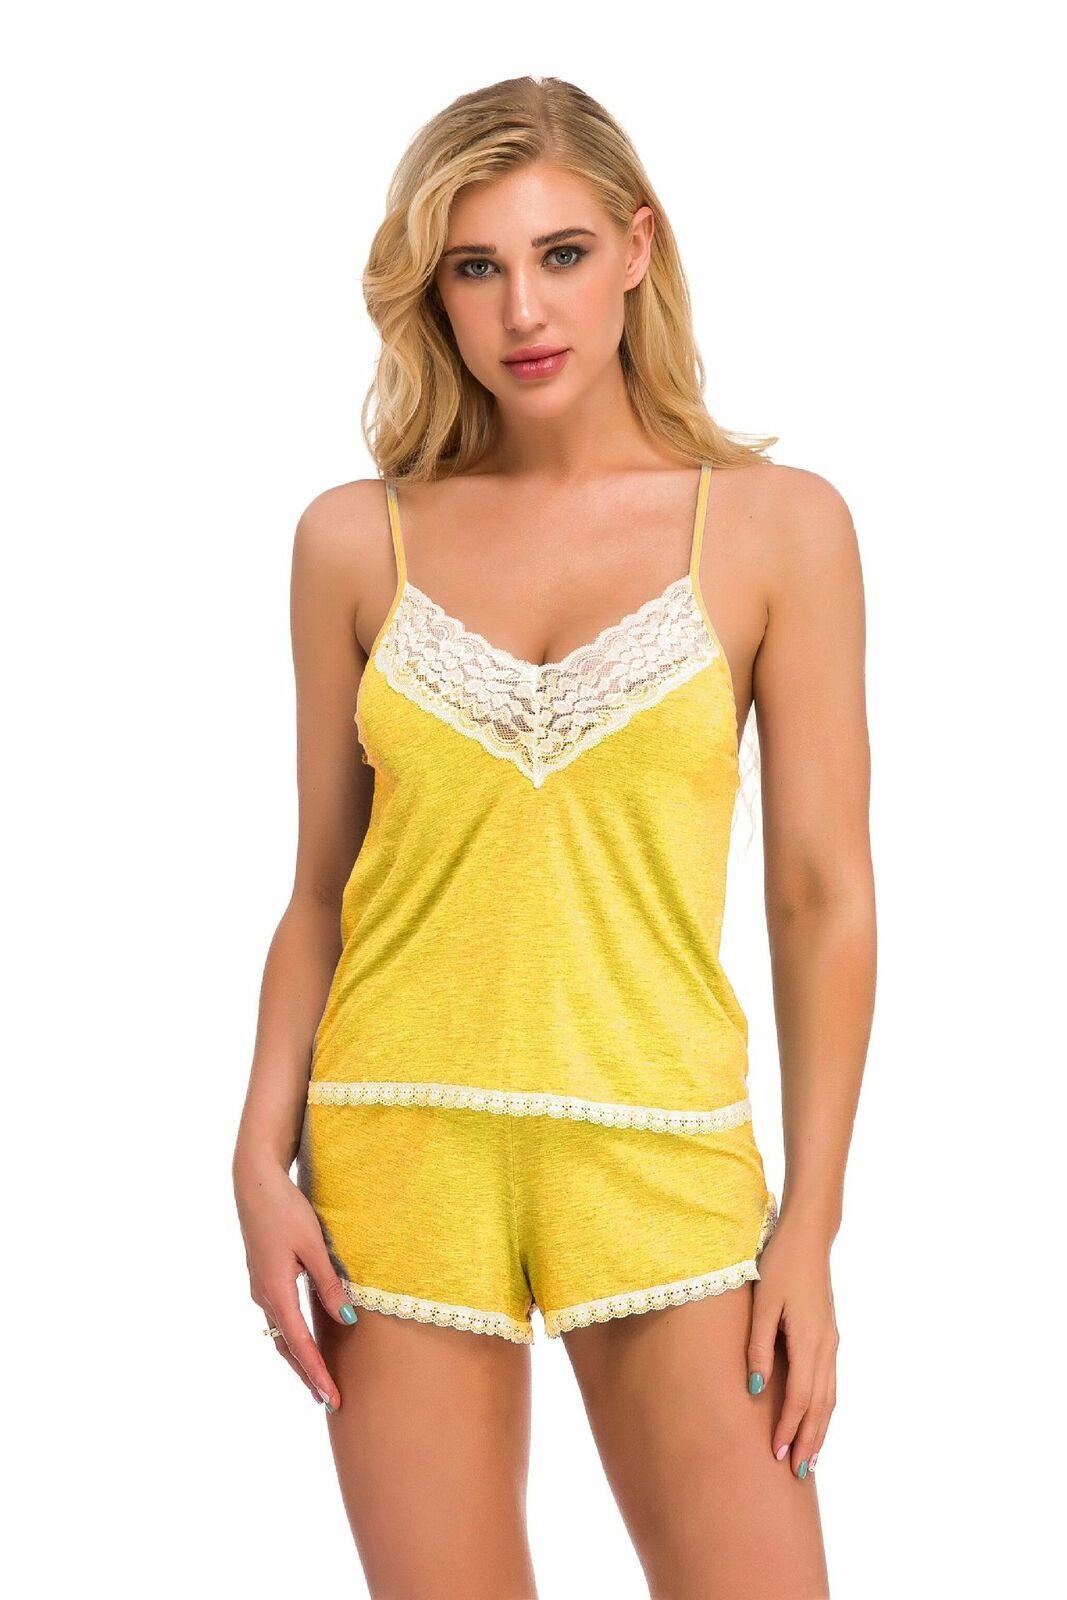 2 Piece Sleepwear Womens Sexy Lingerie Pajamas Cami Shorts Set Nightwear Dress Clothing, Shoes & Accessories